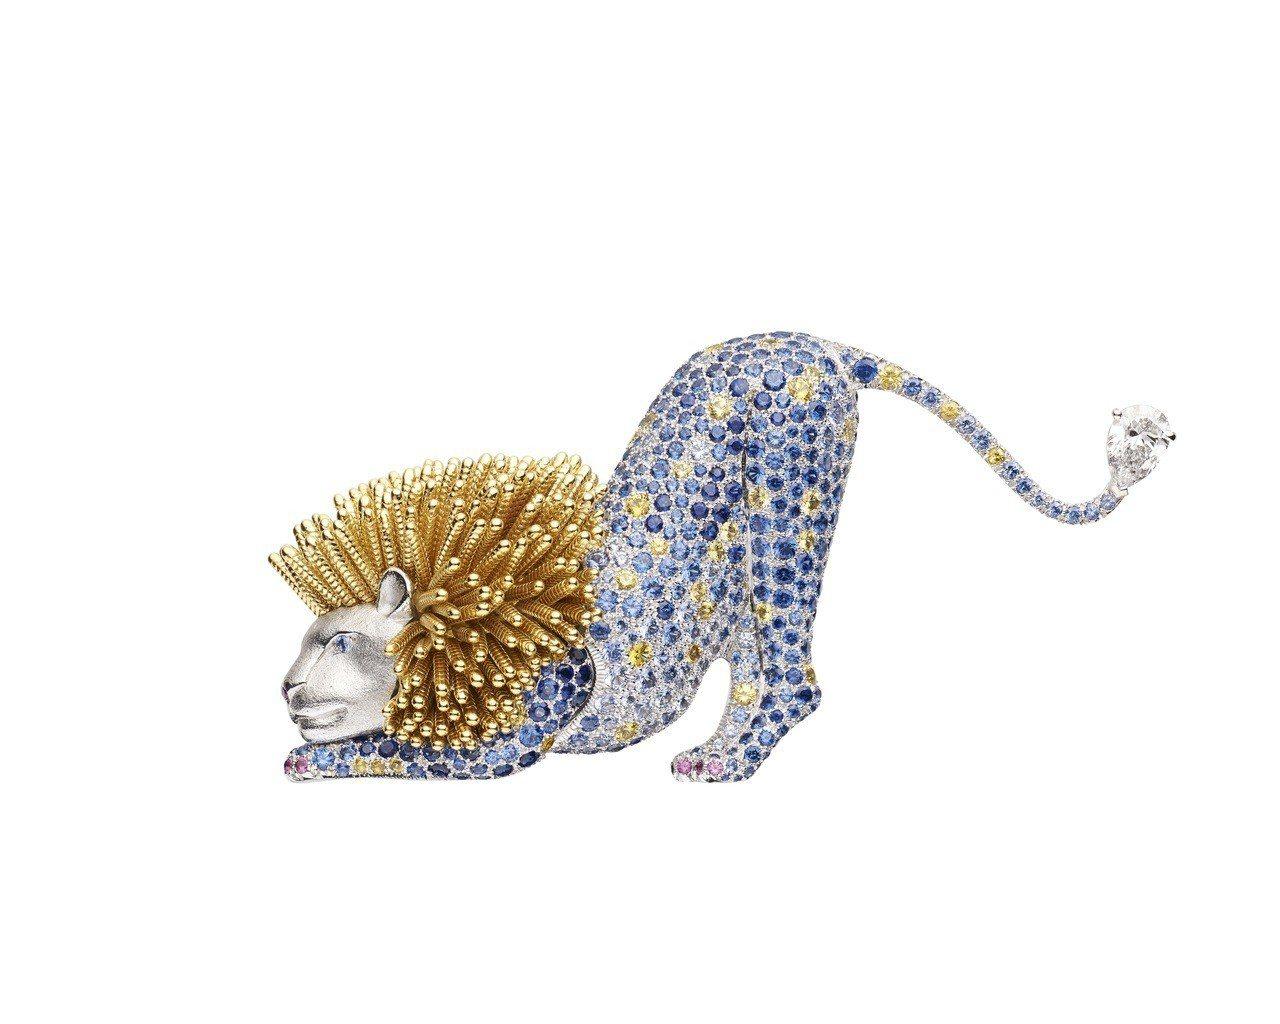 Espiègleries 獅子胸針,18K白金和18K黃金鑲嵌鑽石,950萬3...